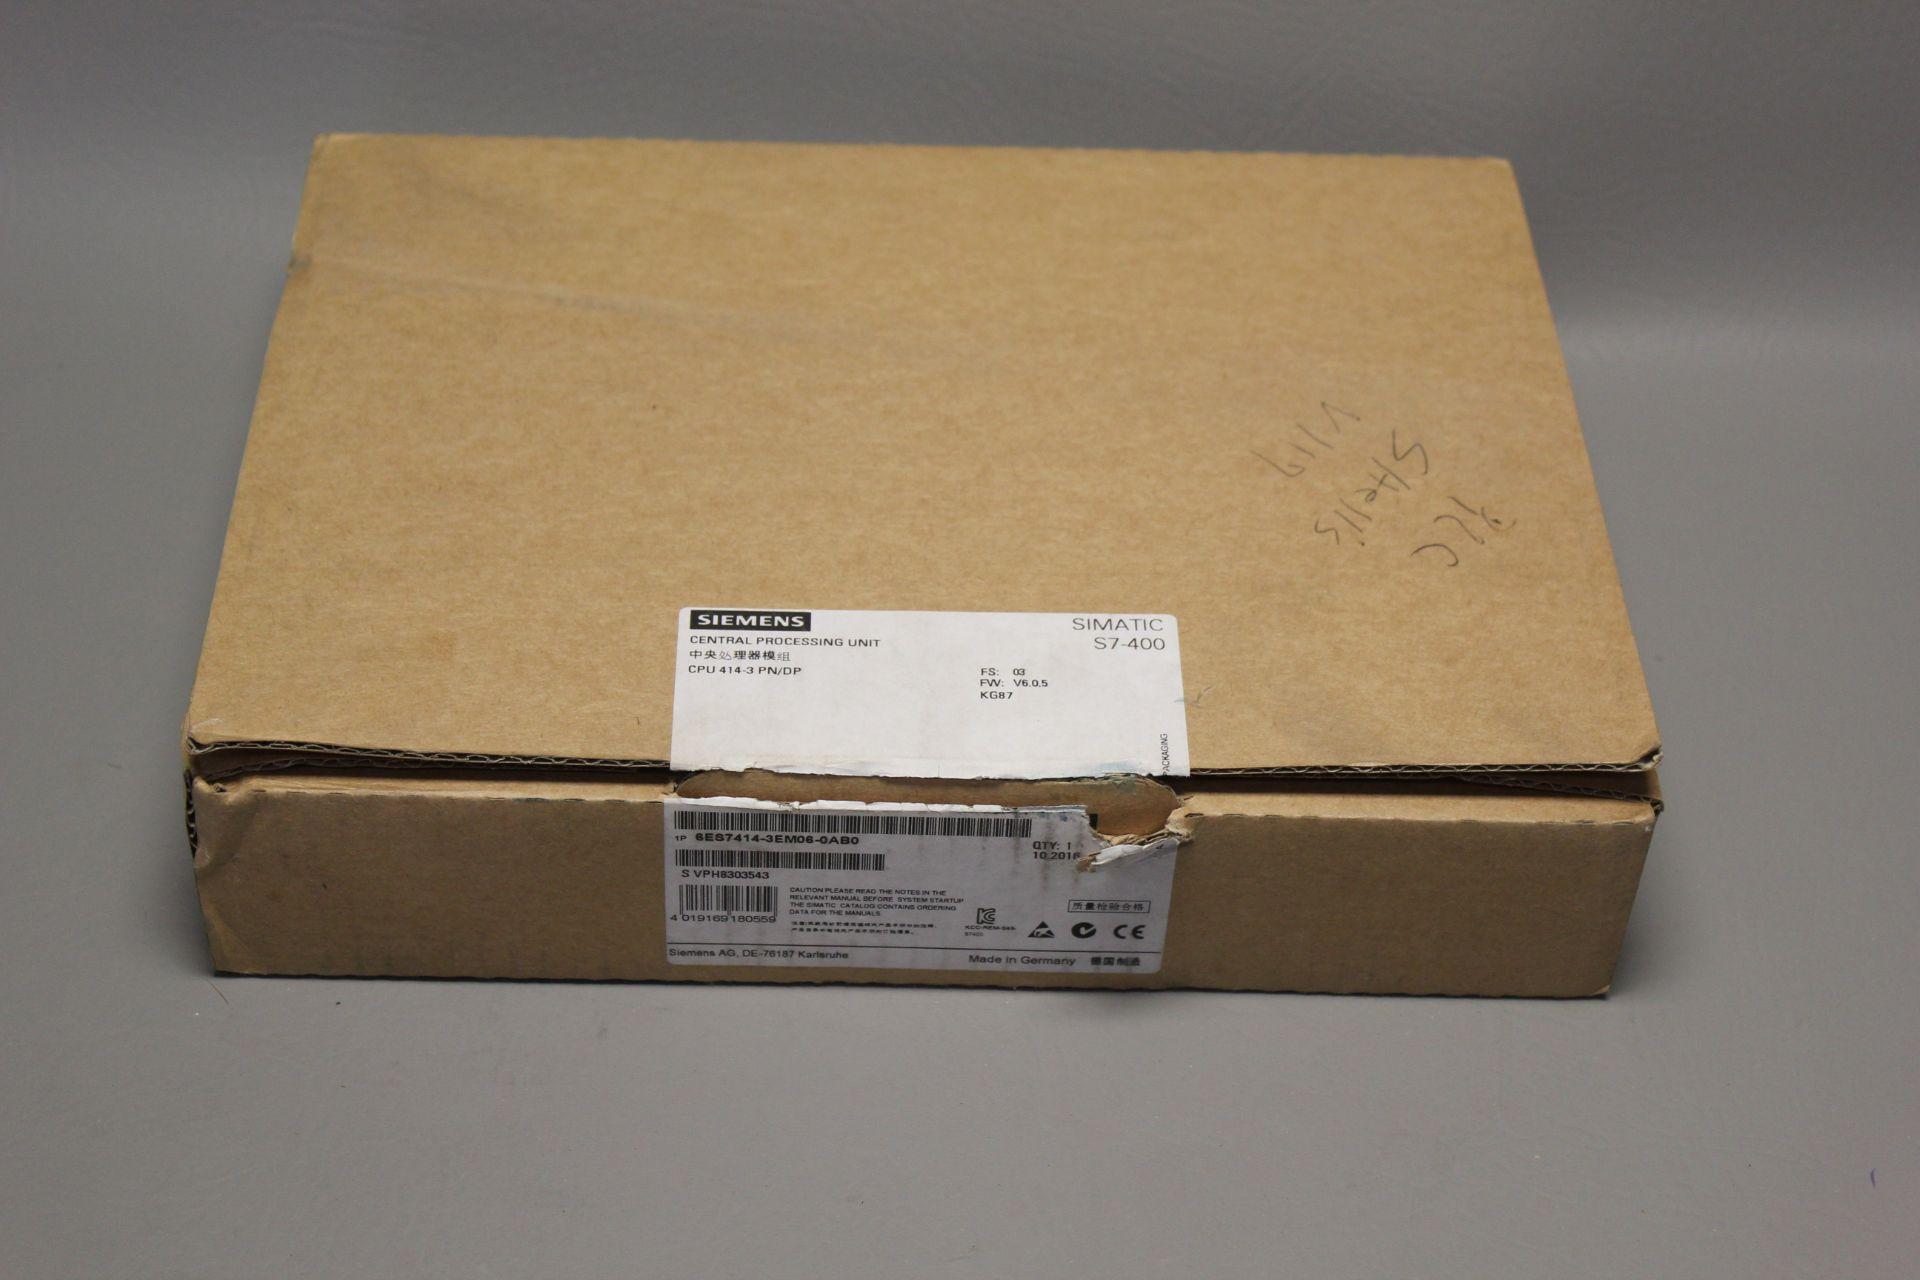 NEW SIEMENS SIMATIC S7-400 PLC CPU PROCESSOR